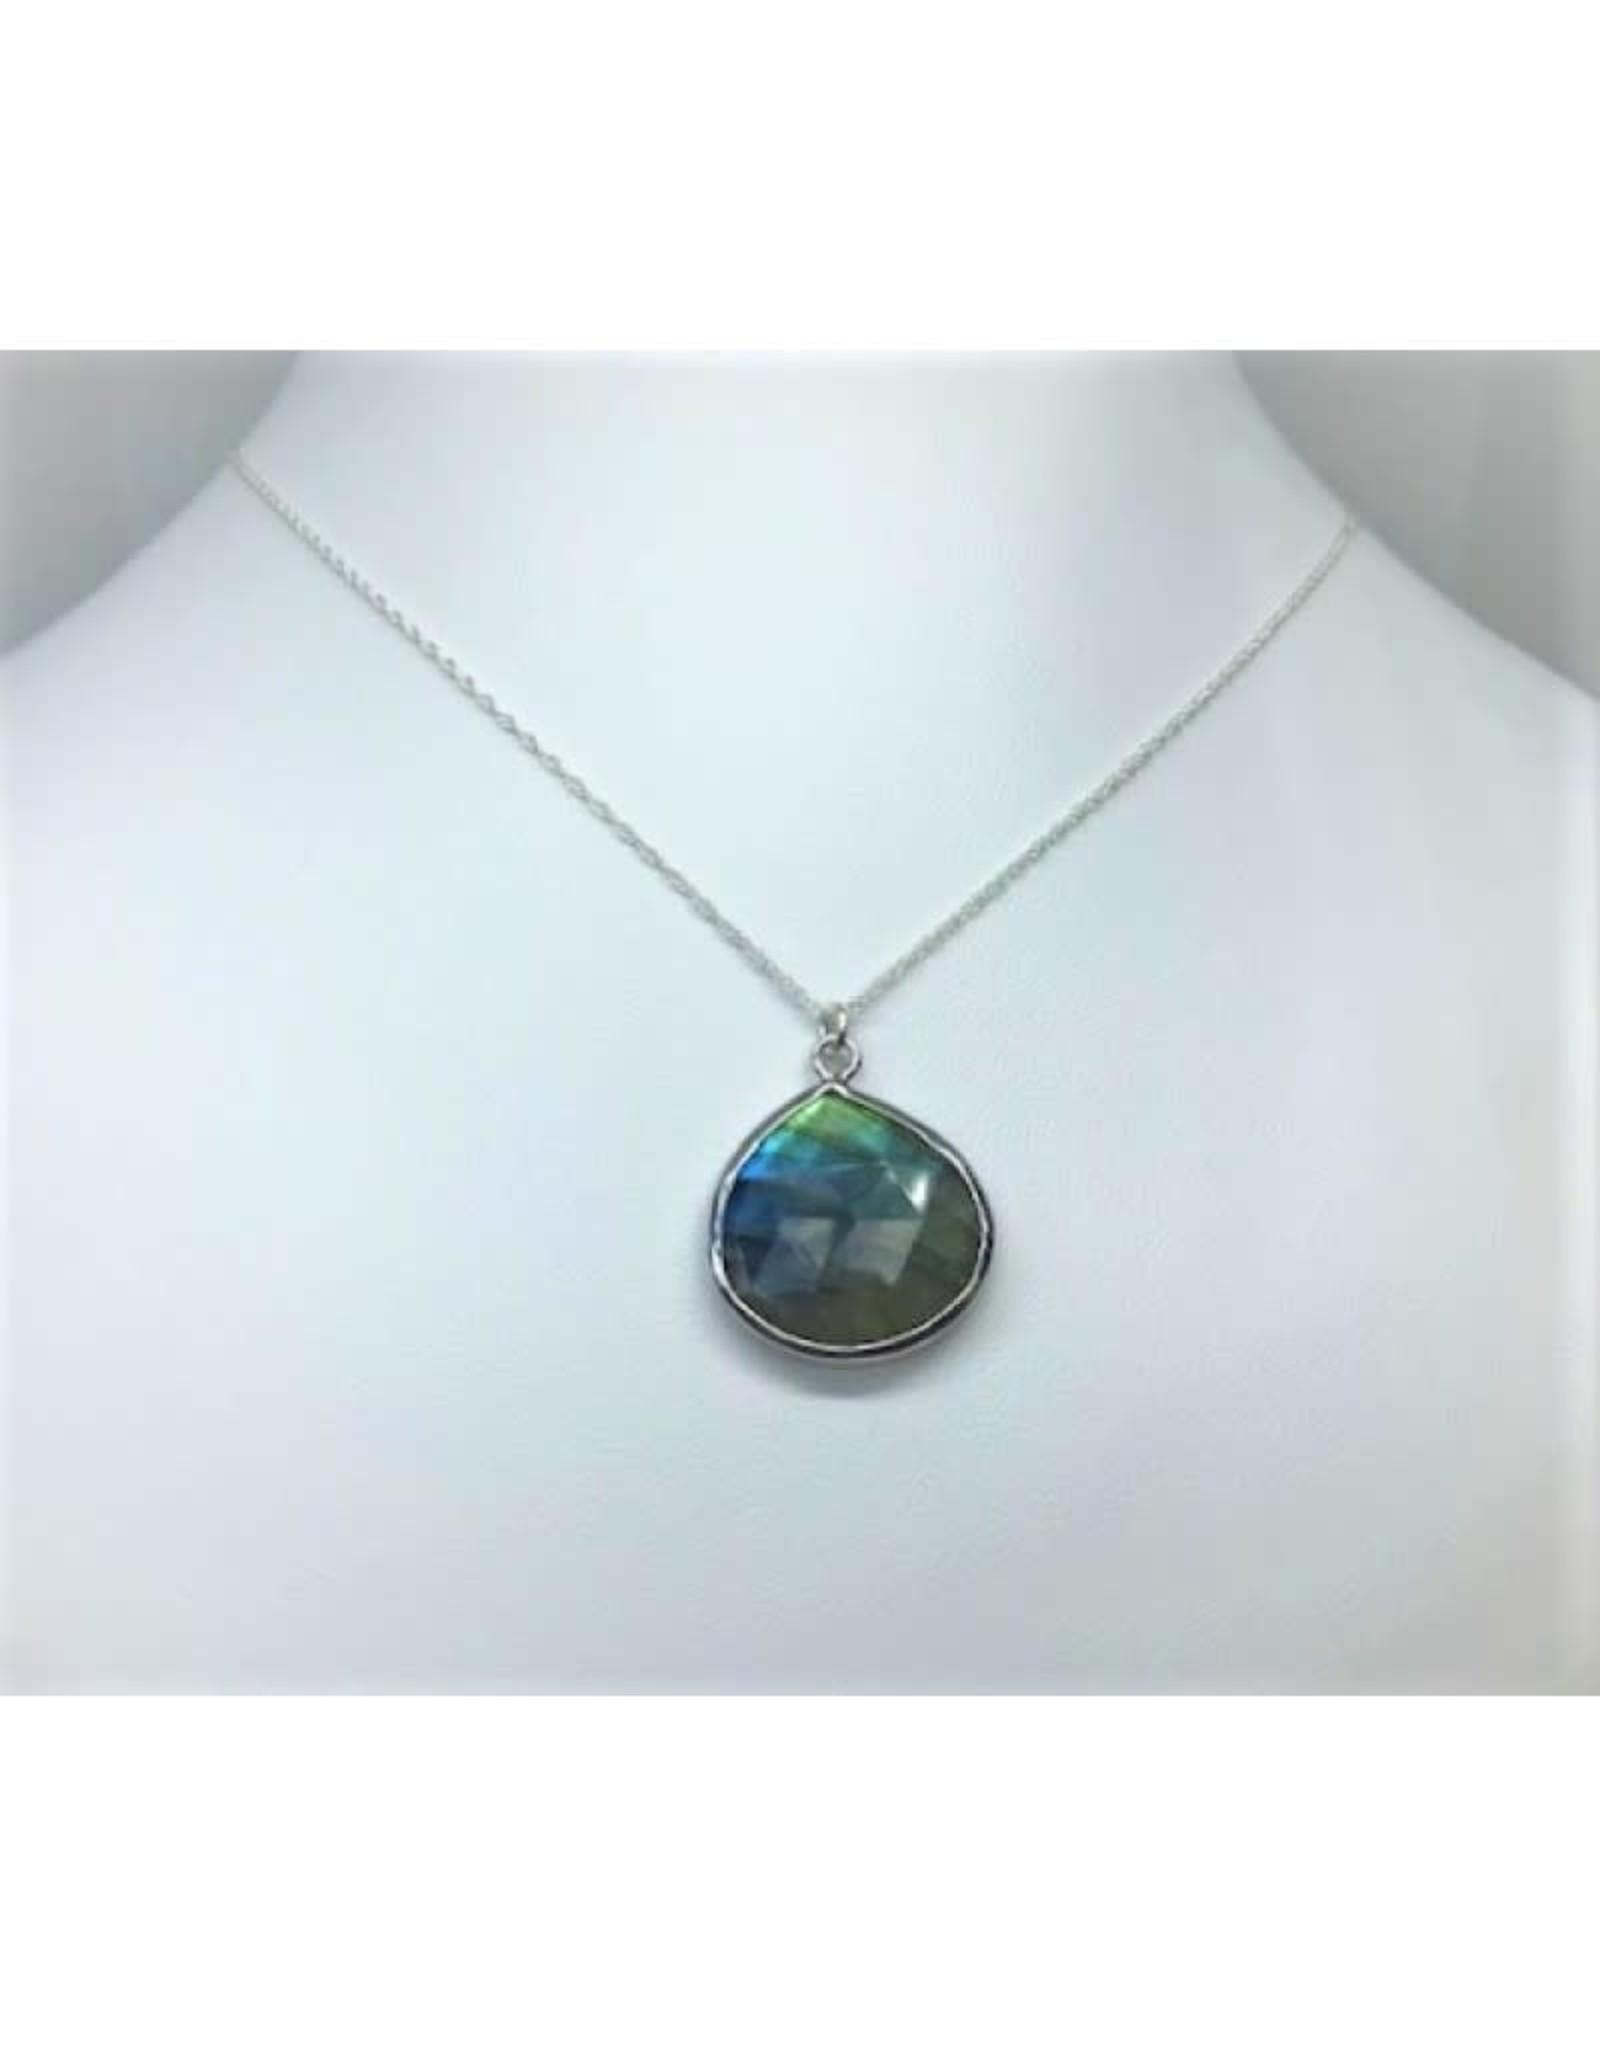 Labradorite Pendant Necklace - Silver